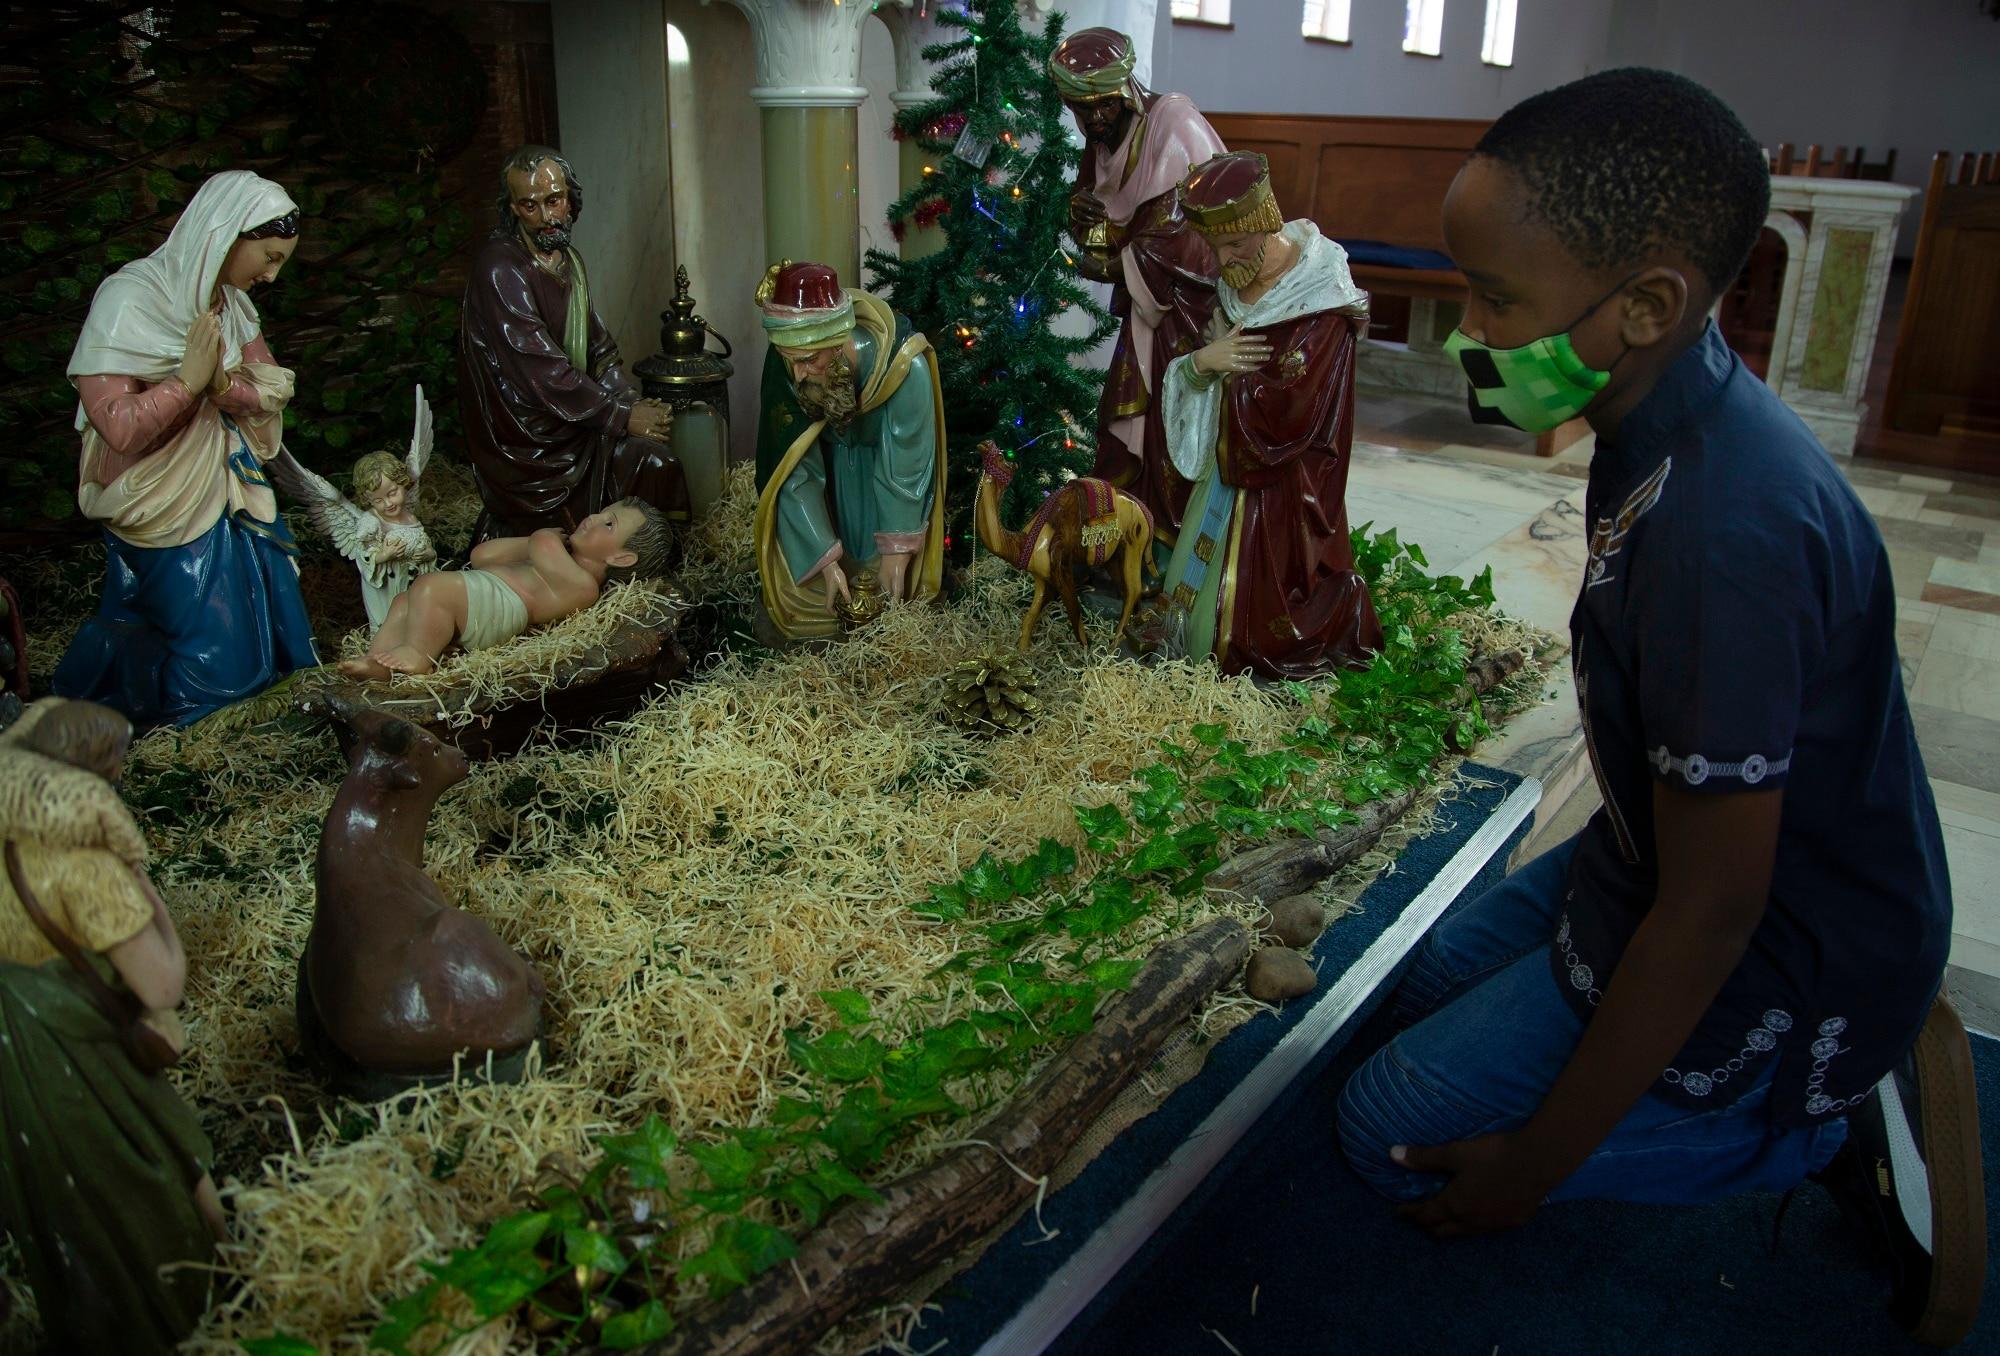 A child attends the Rosebank Catholic Church in Johannesburg.